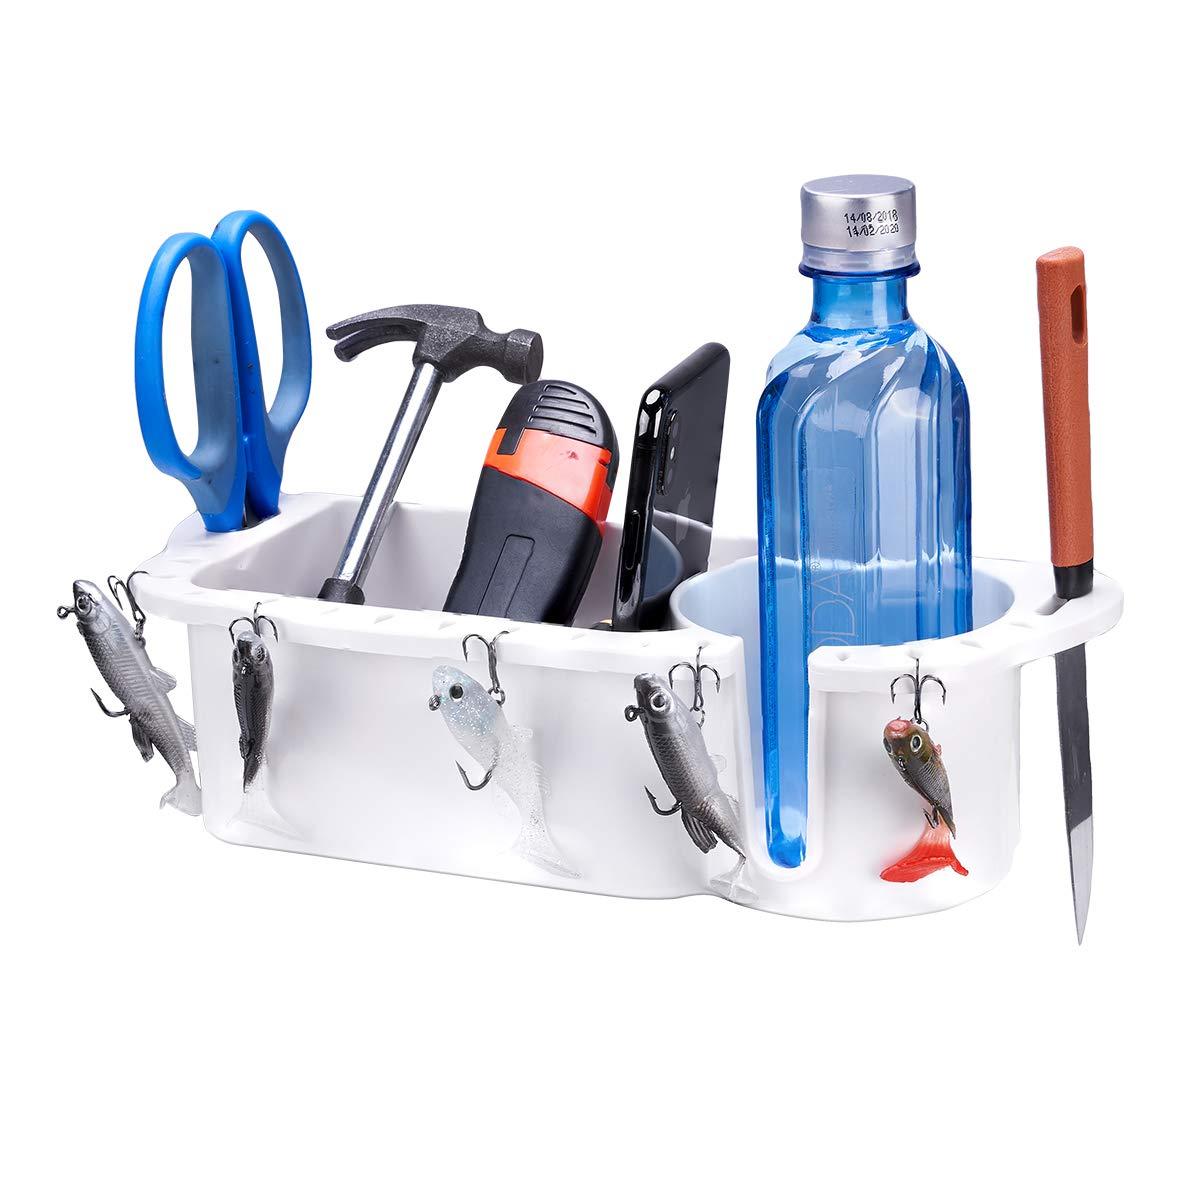 kemimoto Boat Caddy Organizer, Large Marine Cup Holder Household Storage Box White by kemimoto